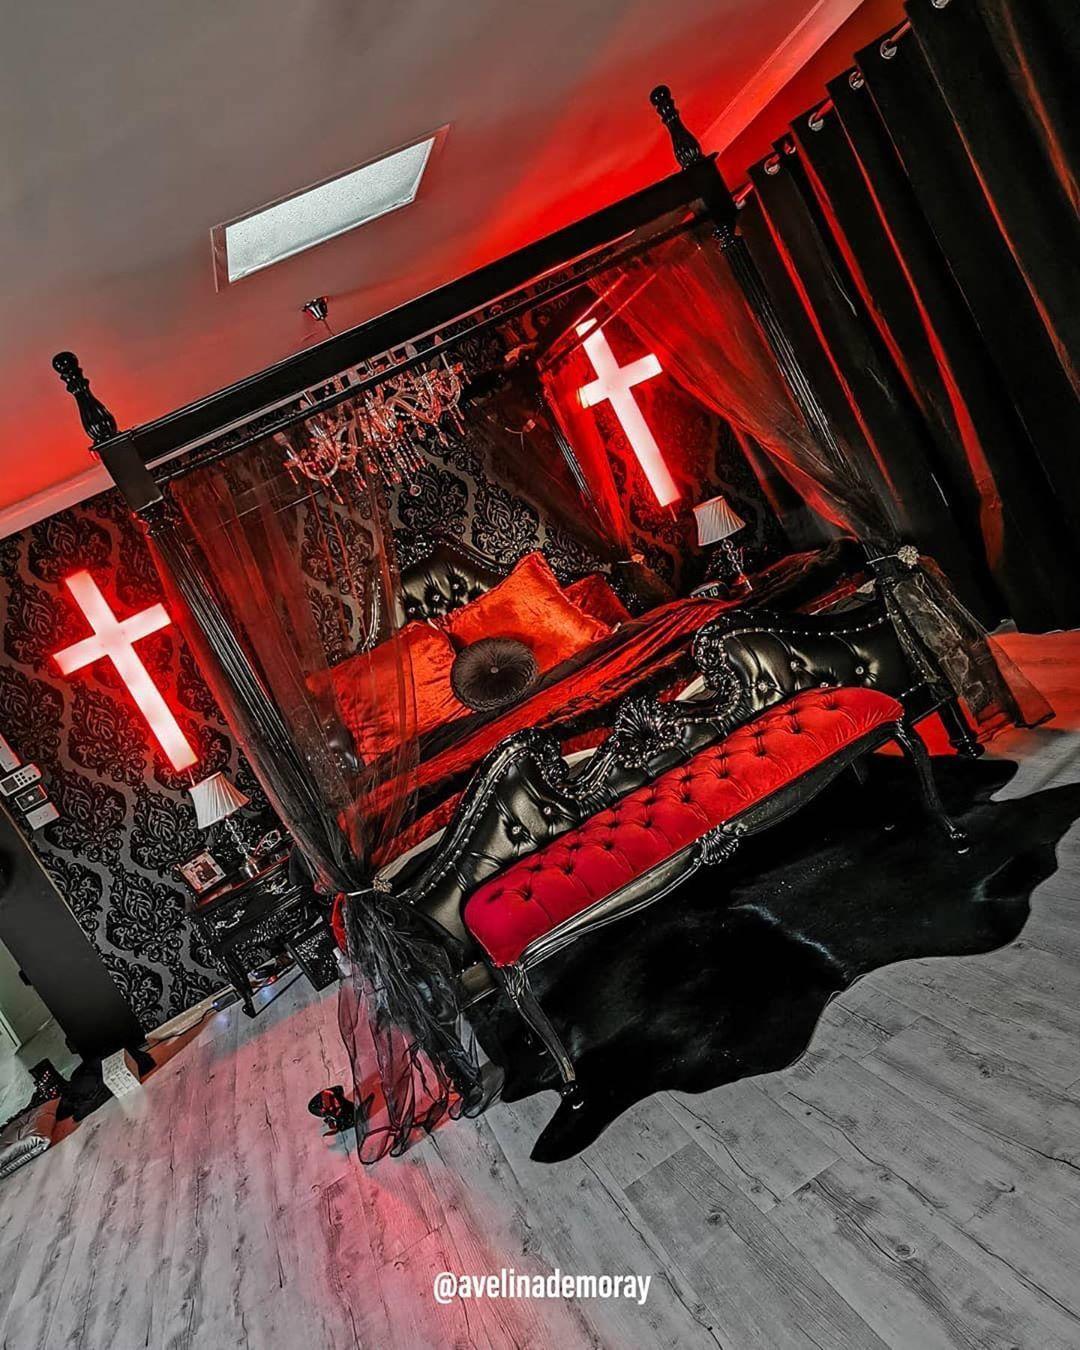 Goth Decor On Instagram Goals Repost Avelinademoray